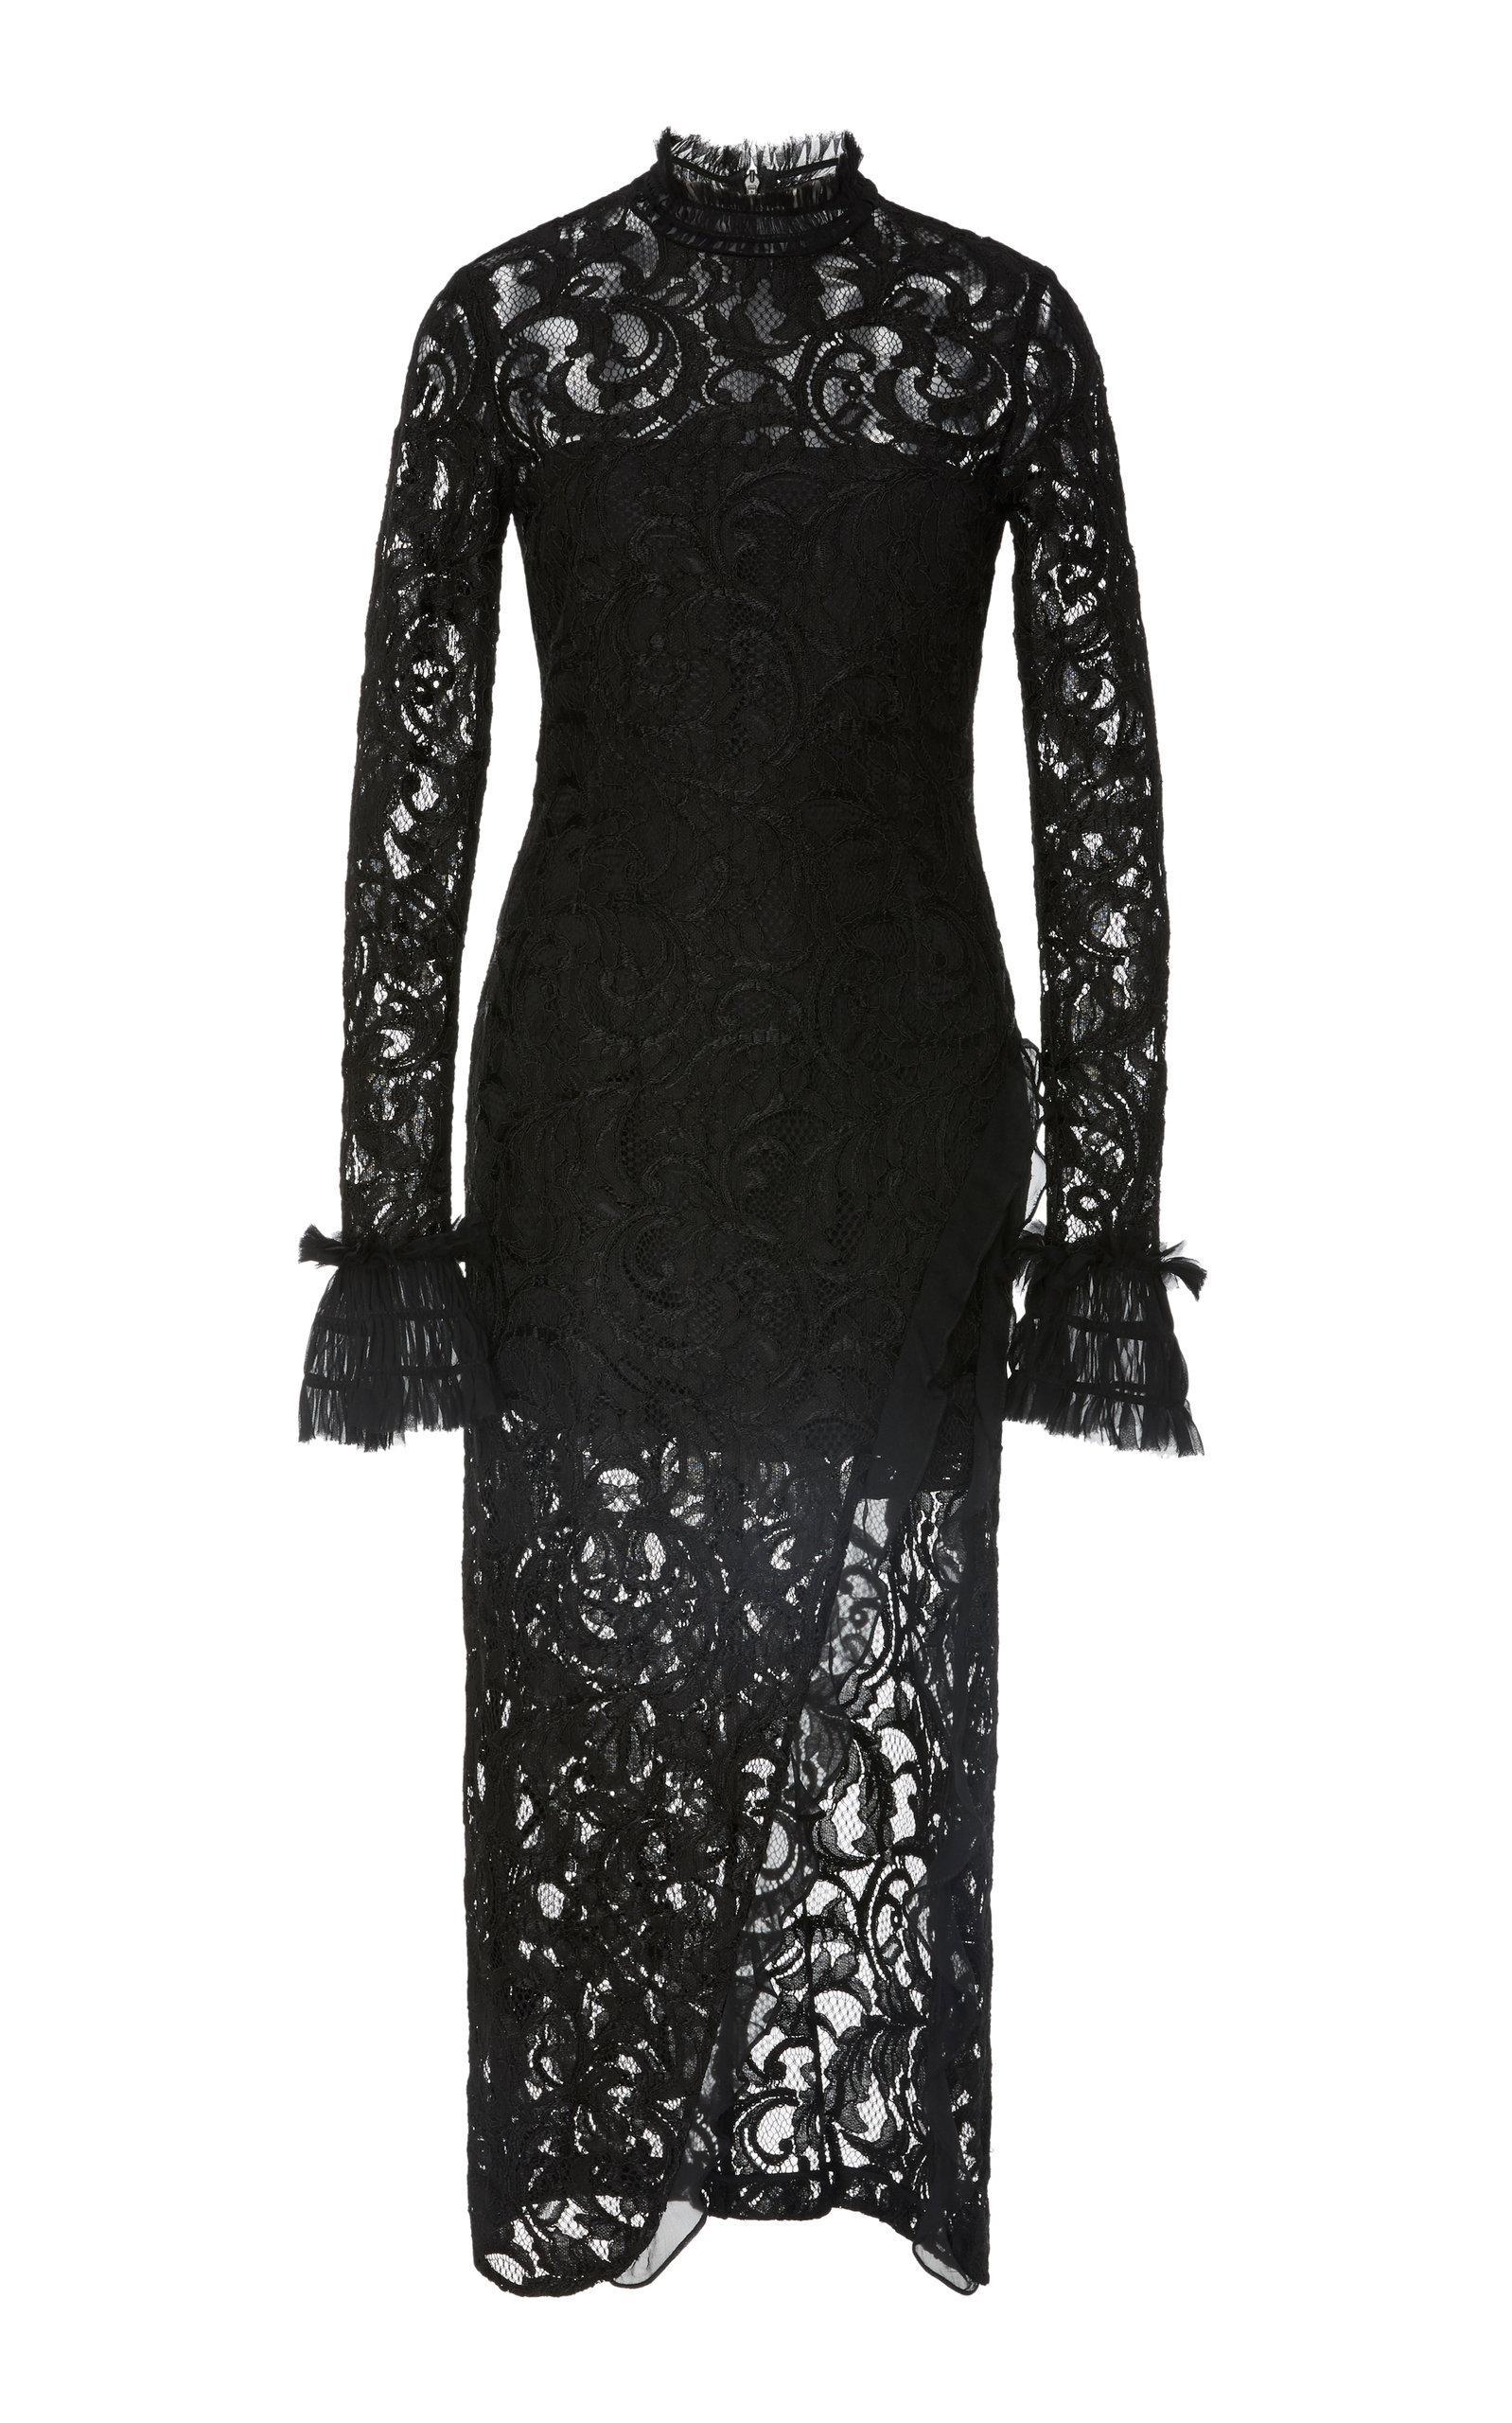 55a93e0a96d10 Alexis Fala Lace Midi Dress in Black - Lyst